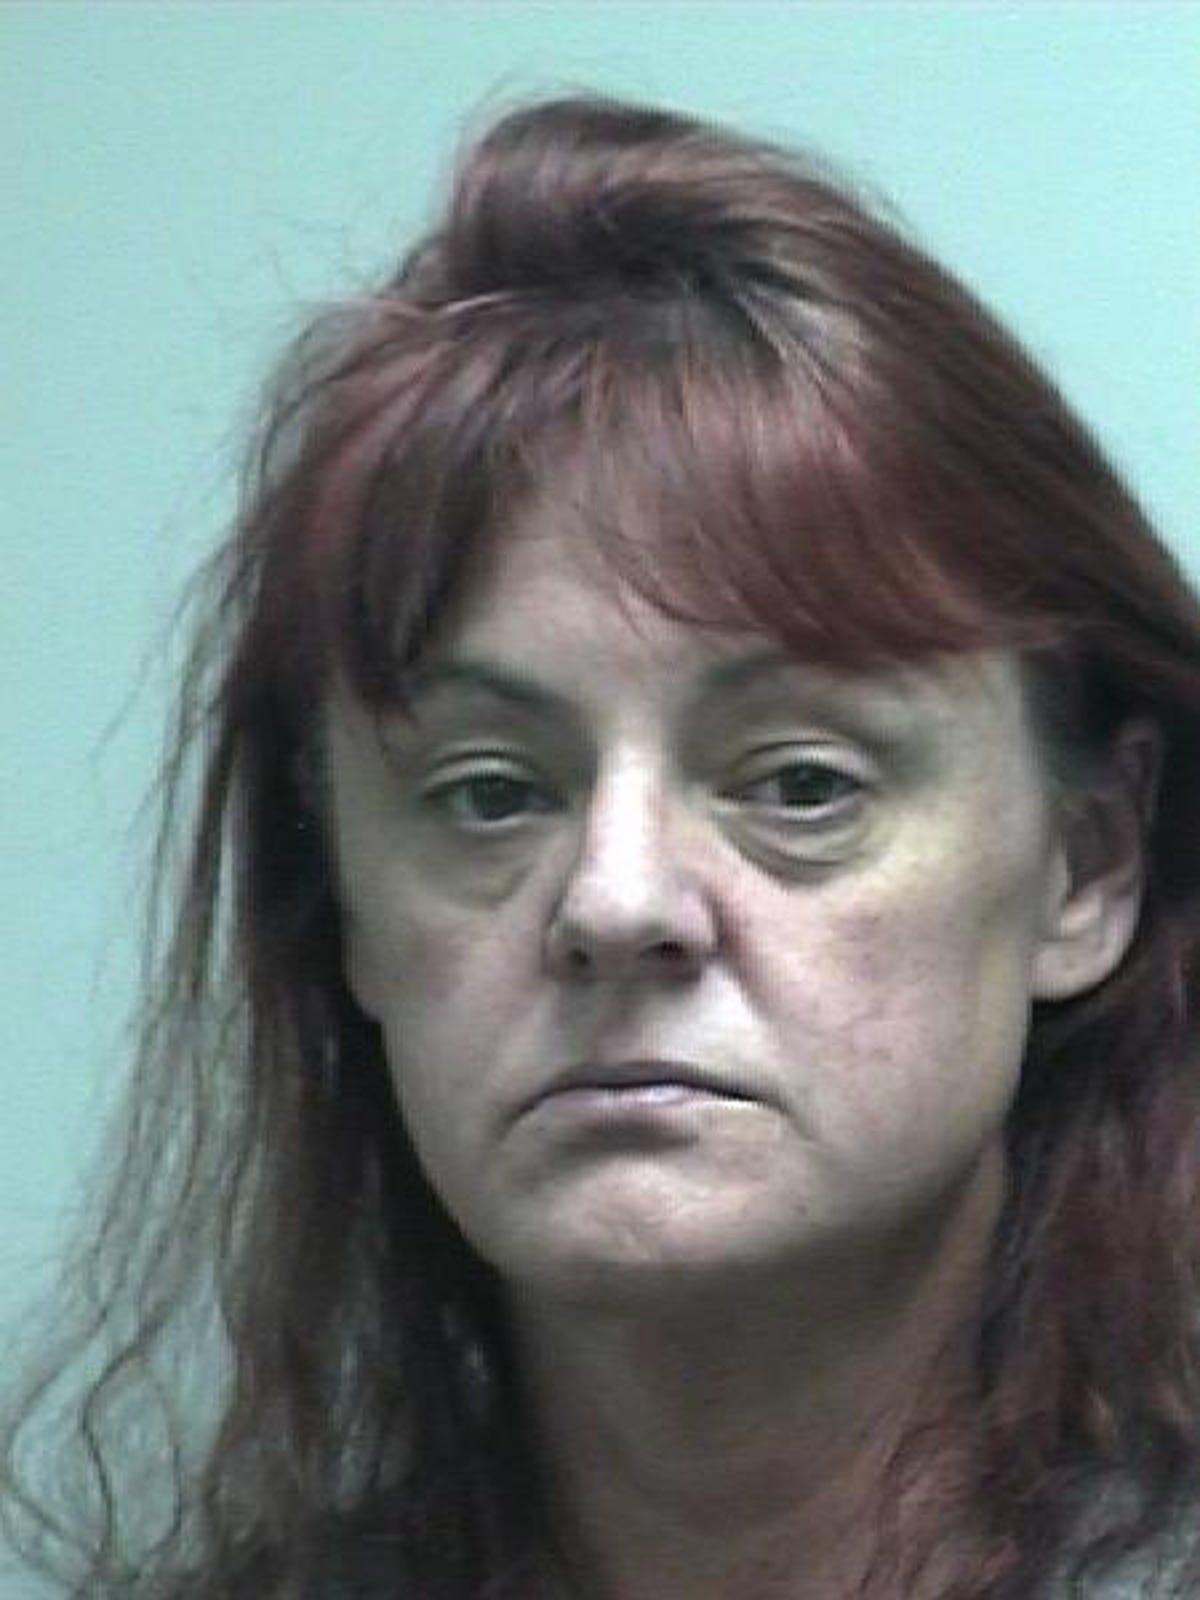 Woman sentenced in Kitsap's largest embezzlement case